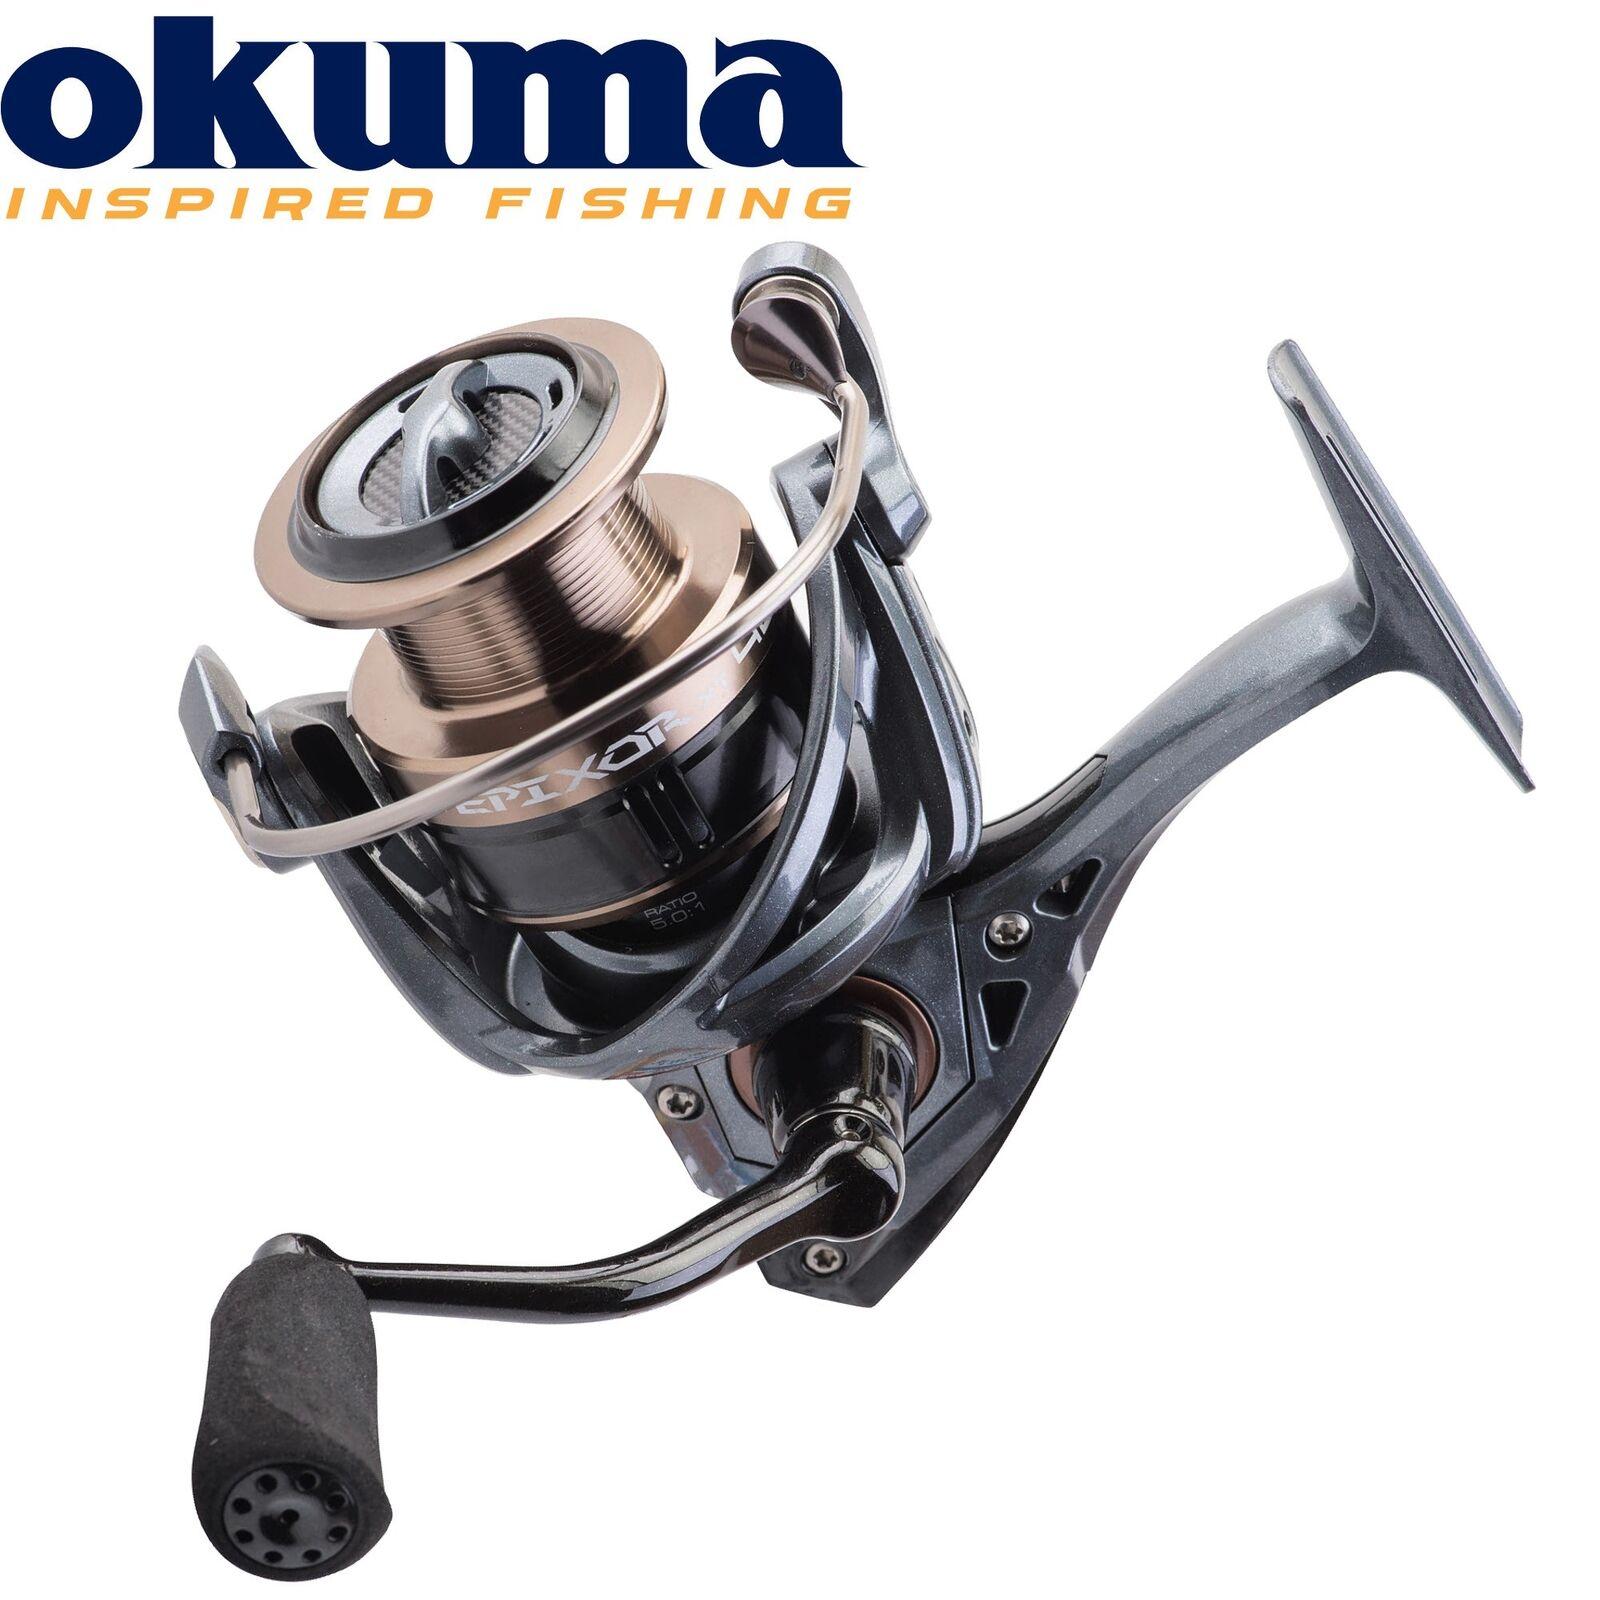 Okuma Epixor XT Spinning EPXT-40 - Spinnrolle für Hecht & Zander, Hechtrolle